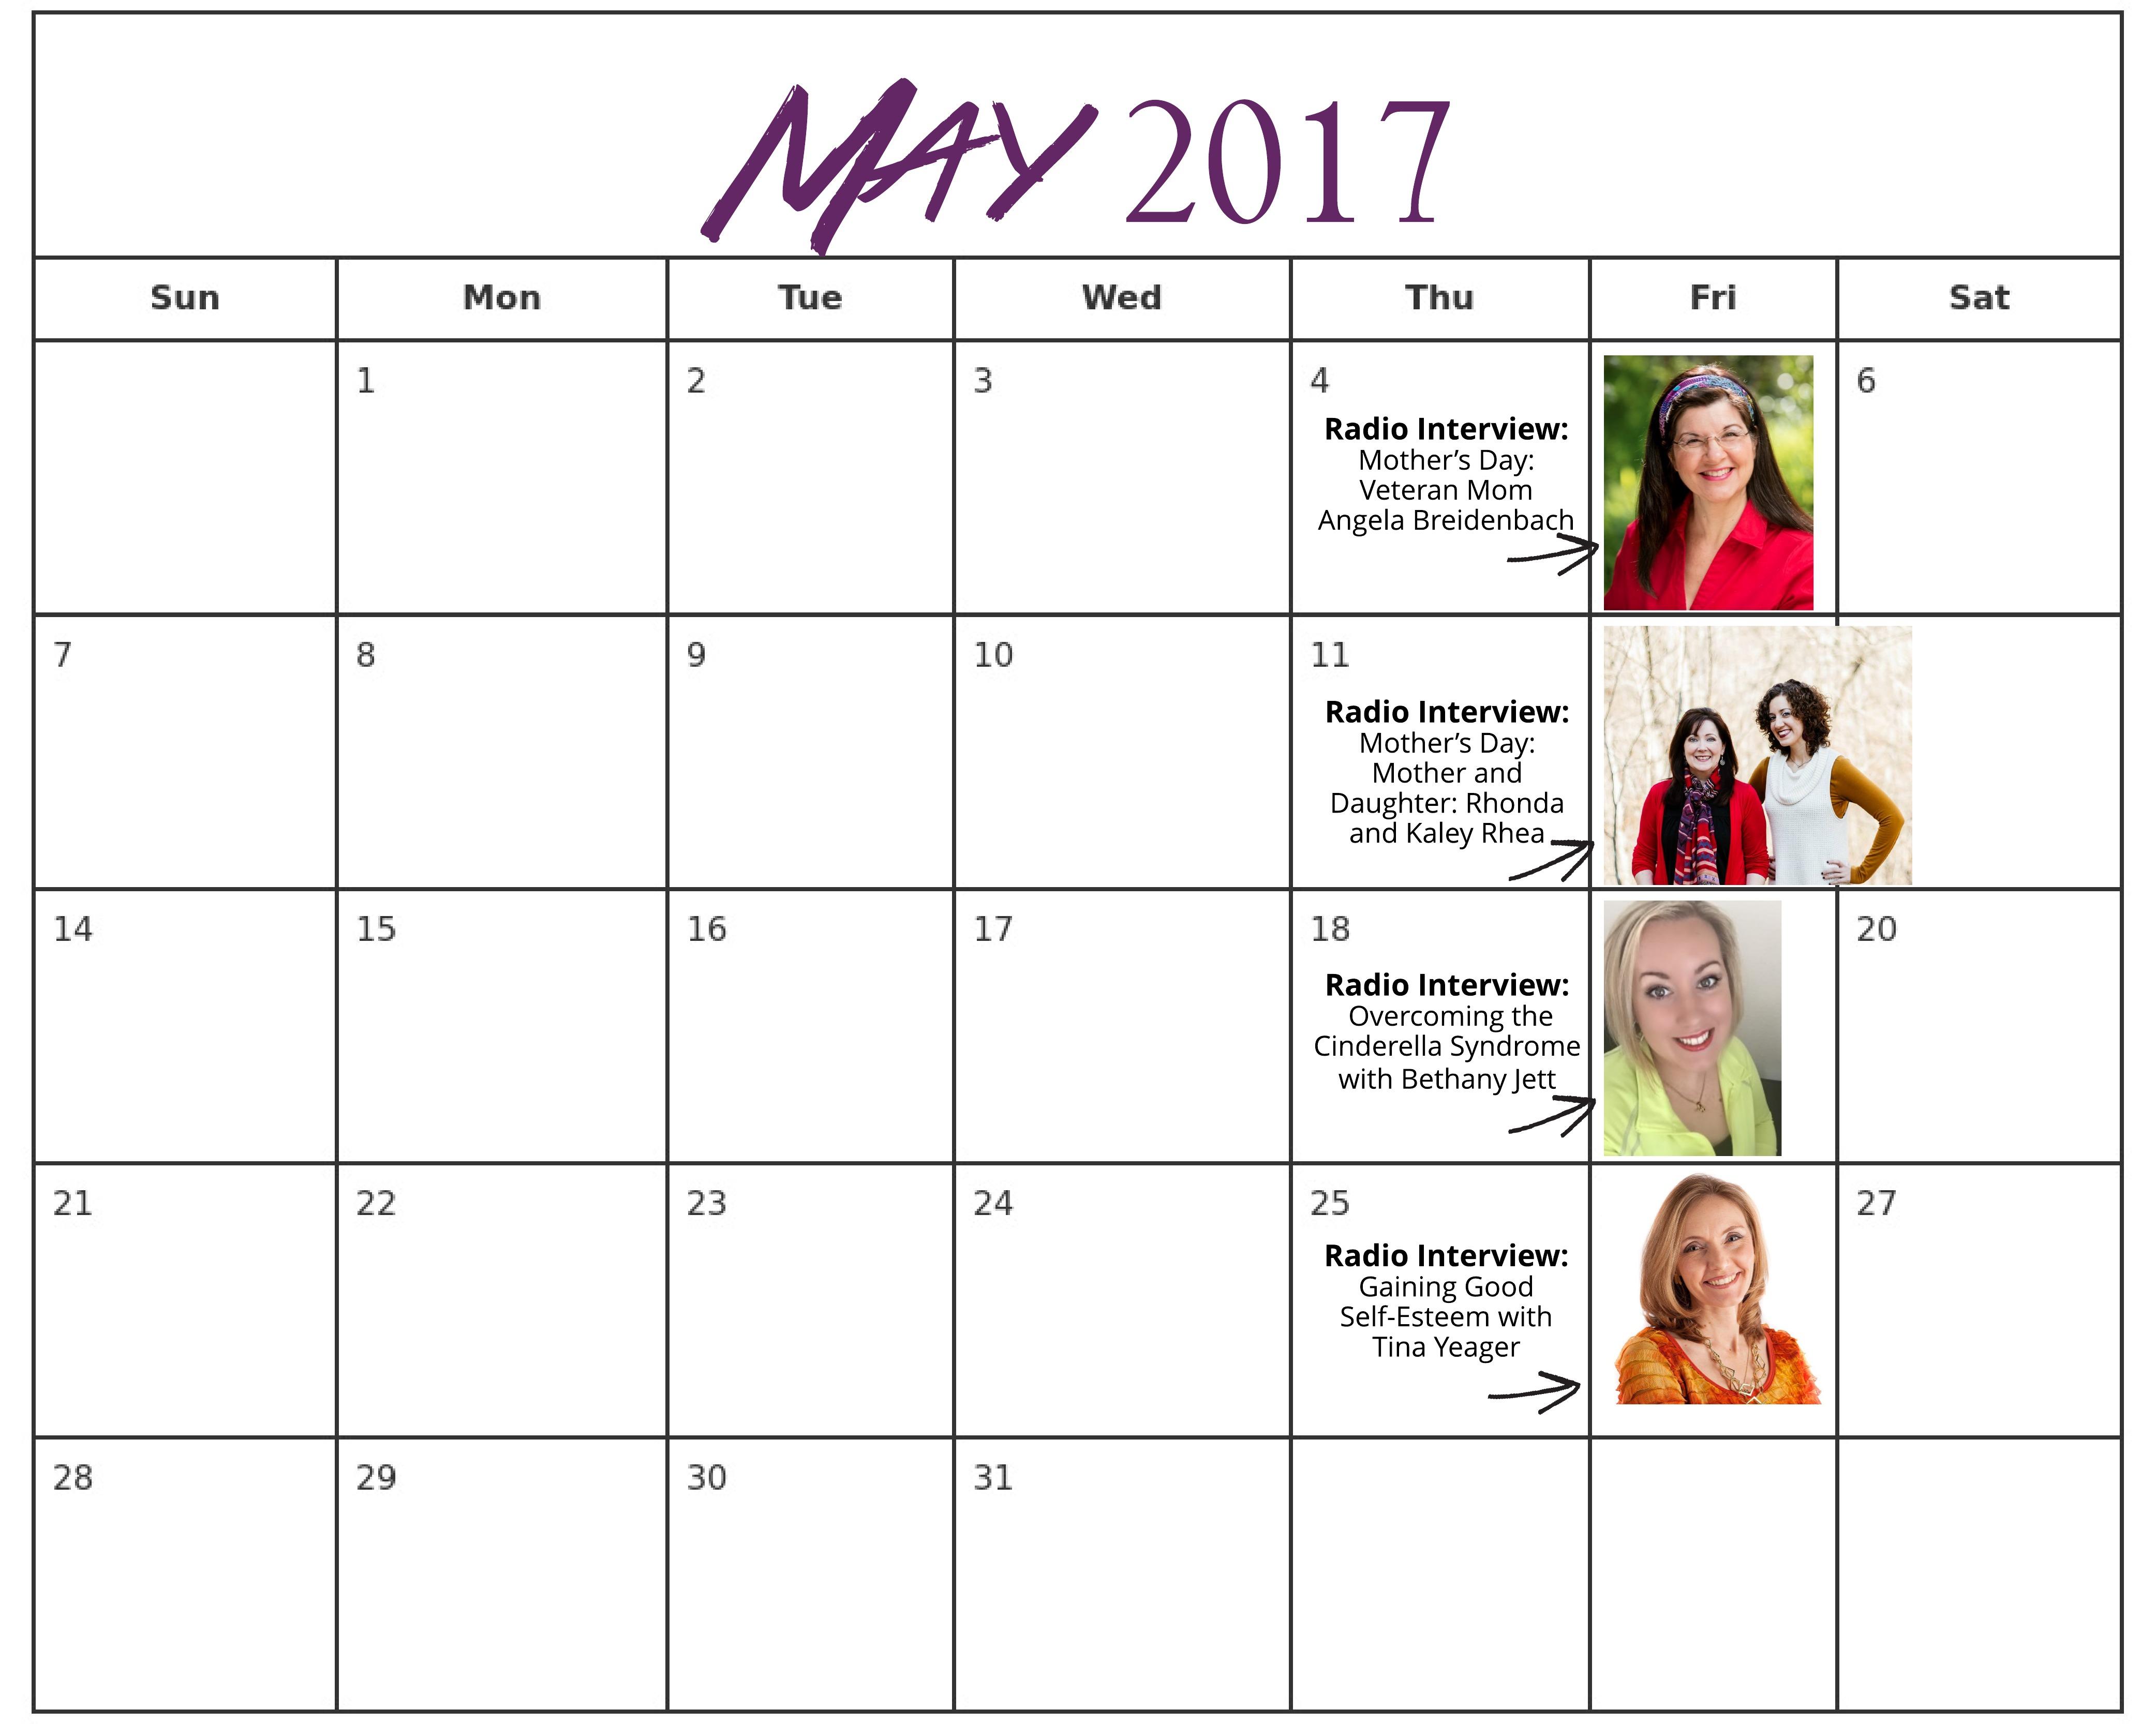 May 2017 Radio Schedule for Website